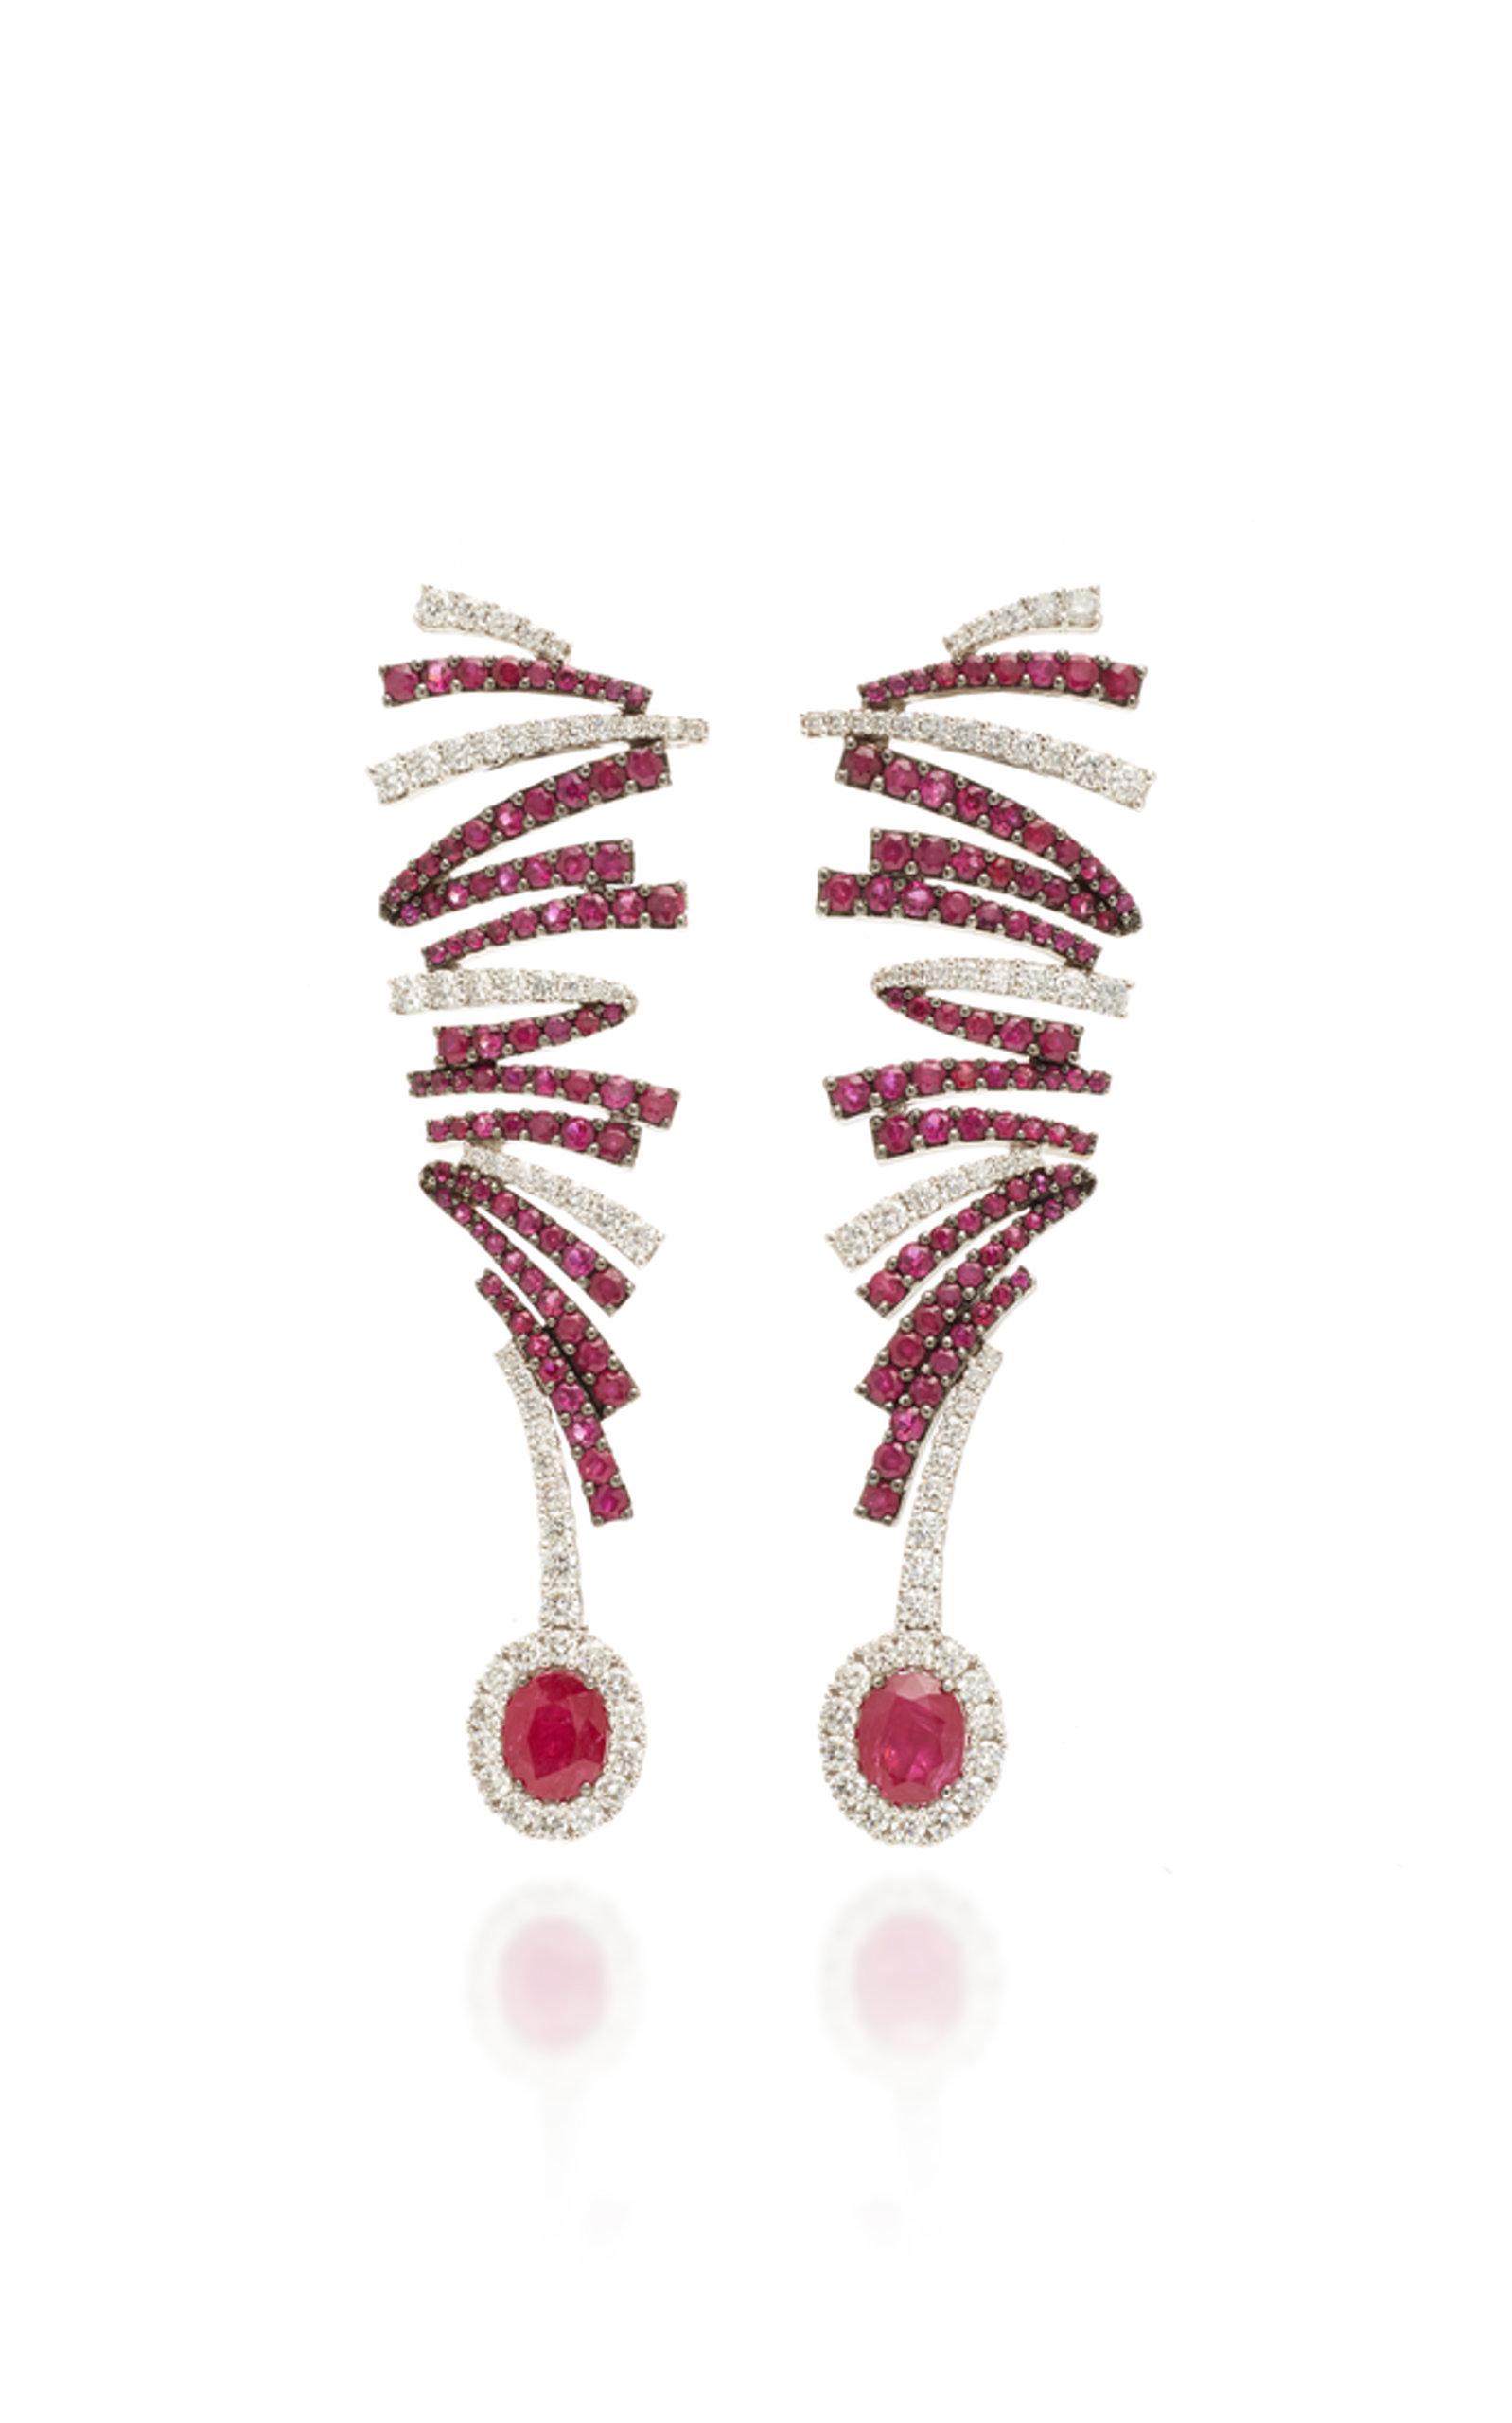 LABYRINTH RUBY EARRINGS